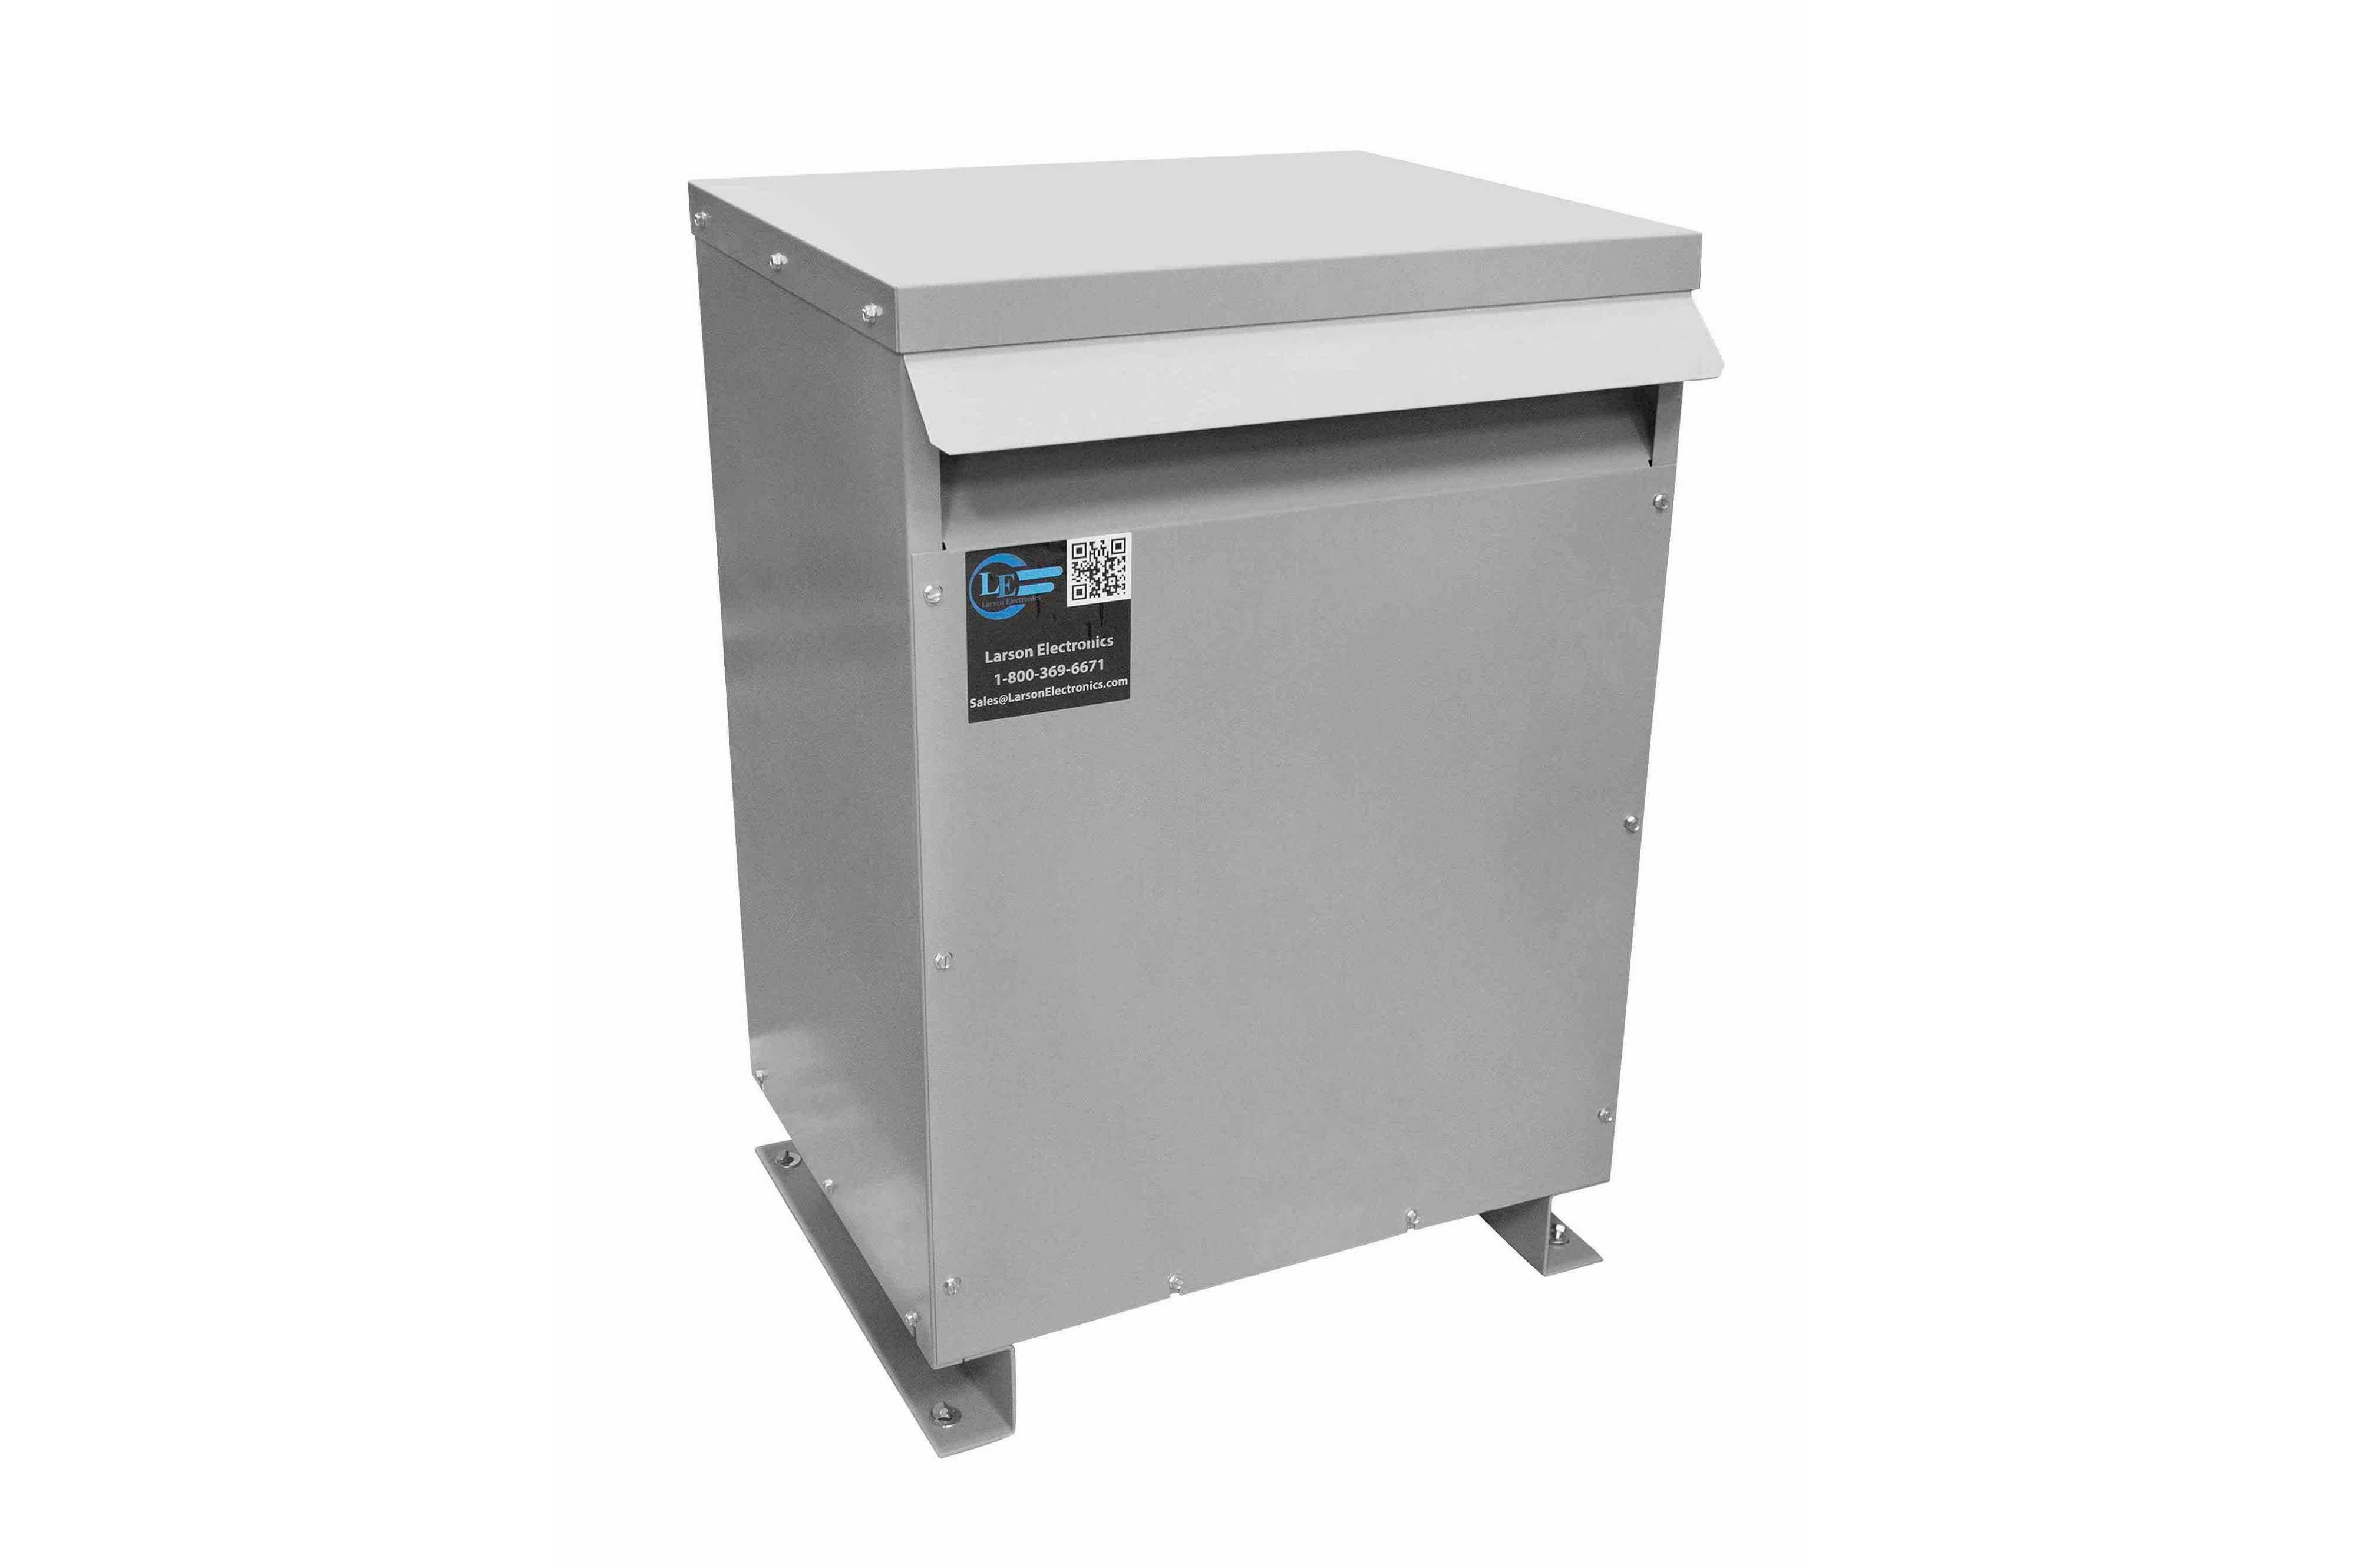 800 kVA 3PH DOE Transformer, 220V Delta Primary, 480Y/277 Wye-N Secondary, N3R, Ventilated, 60 Hz